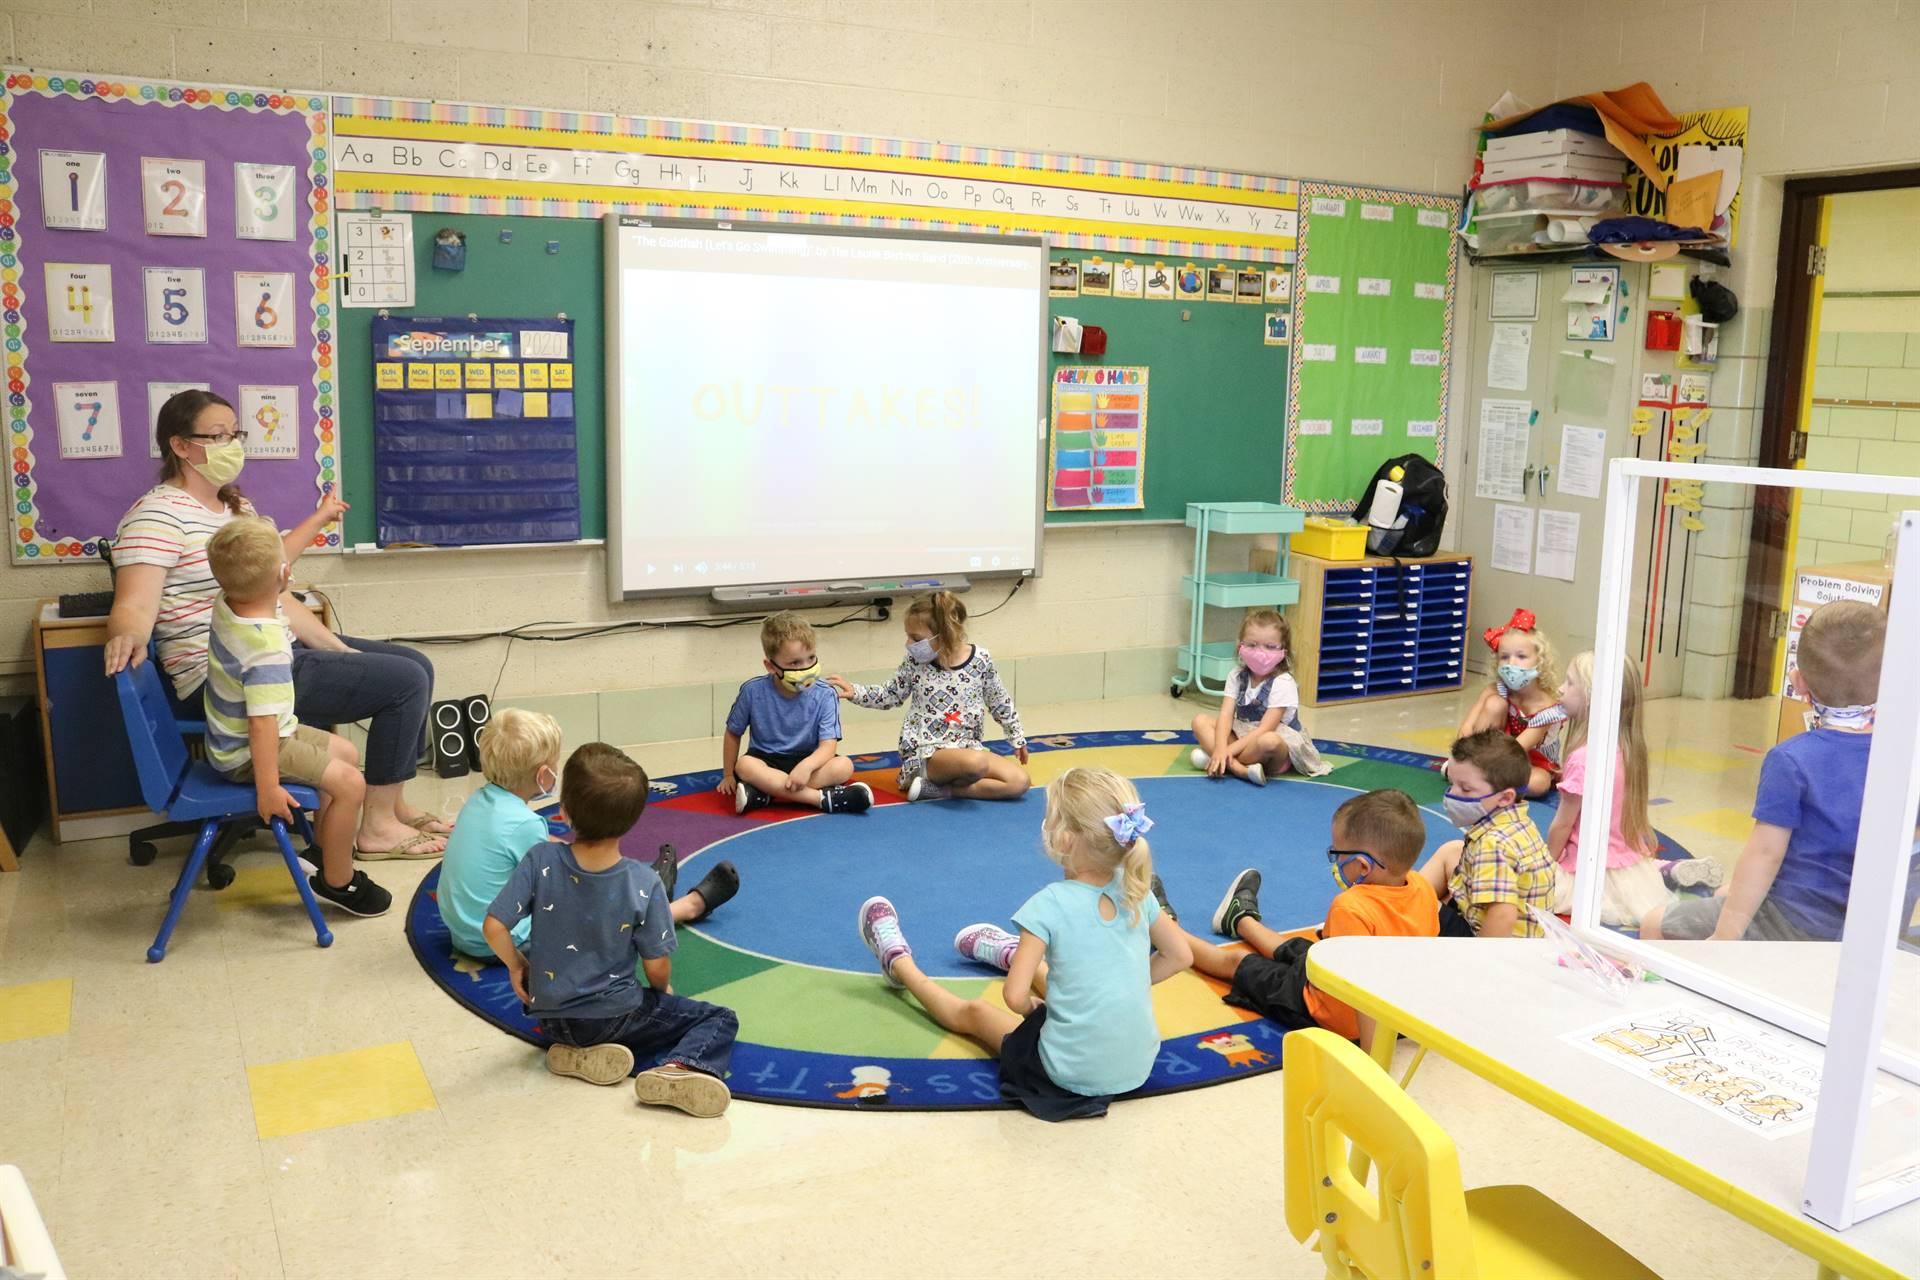 kids sitting in circle on floor